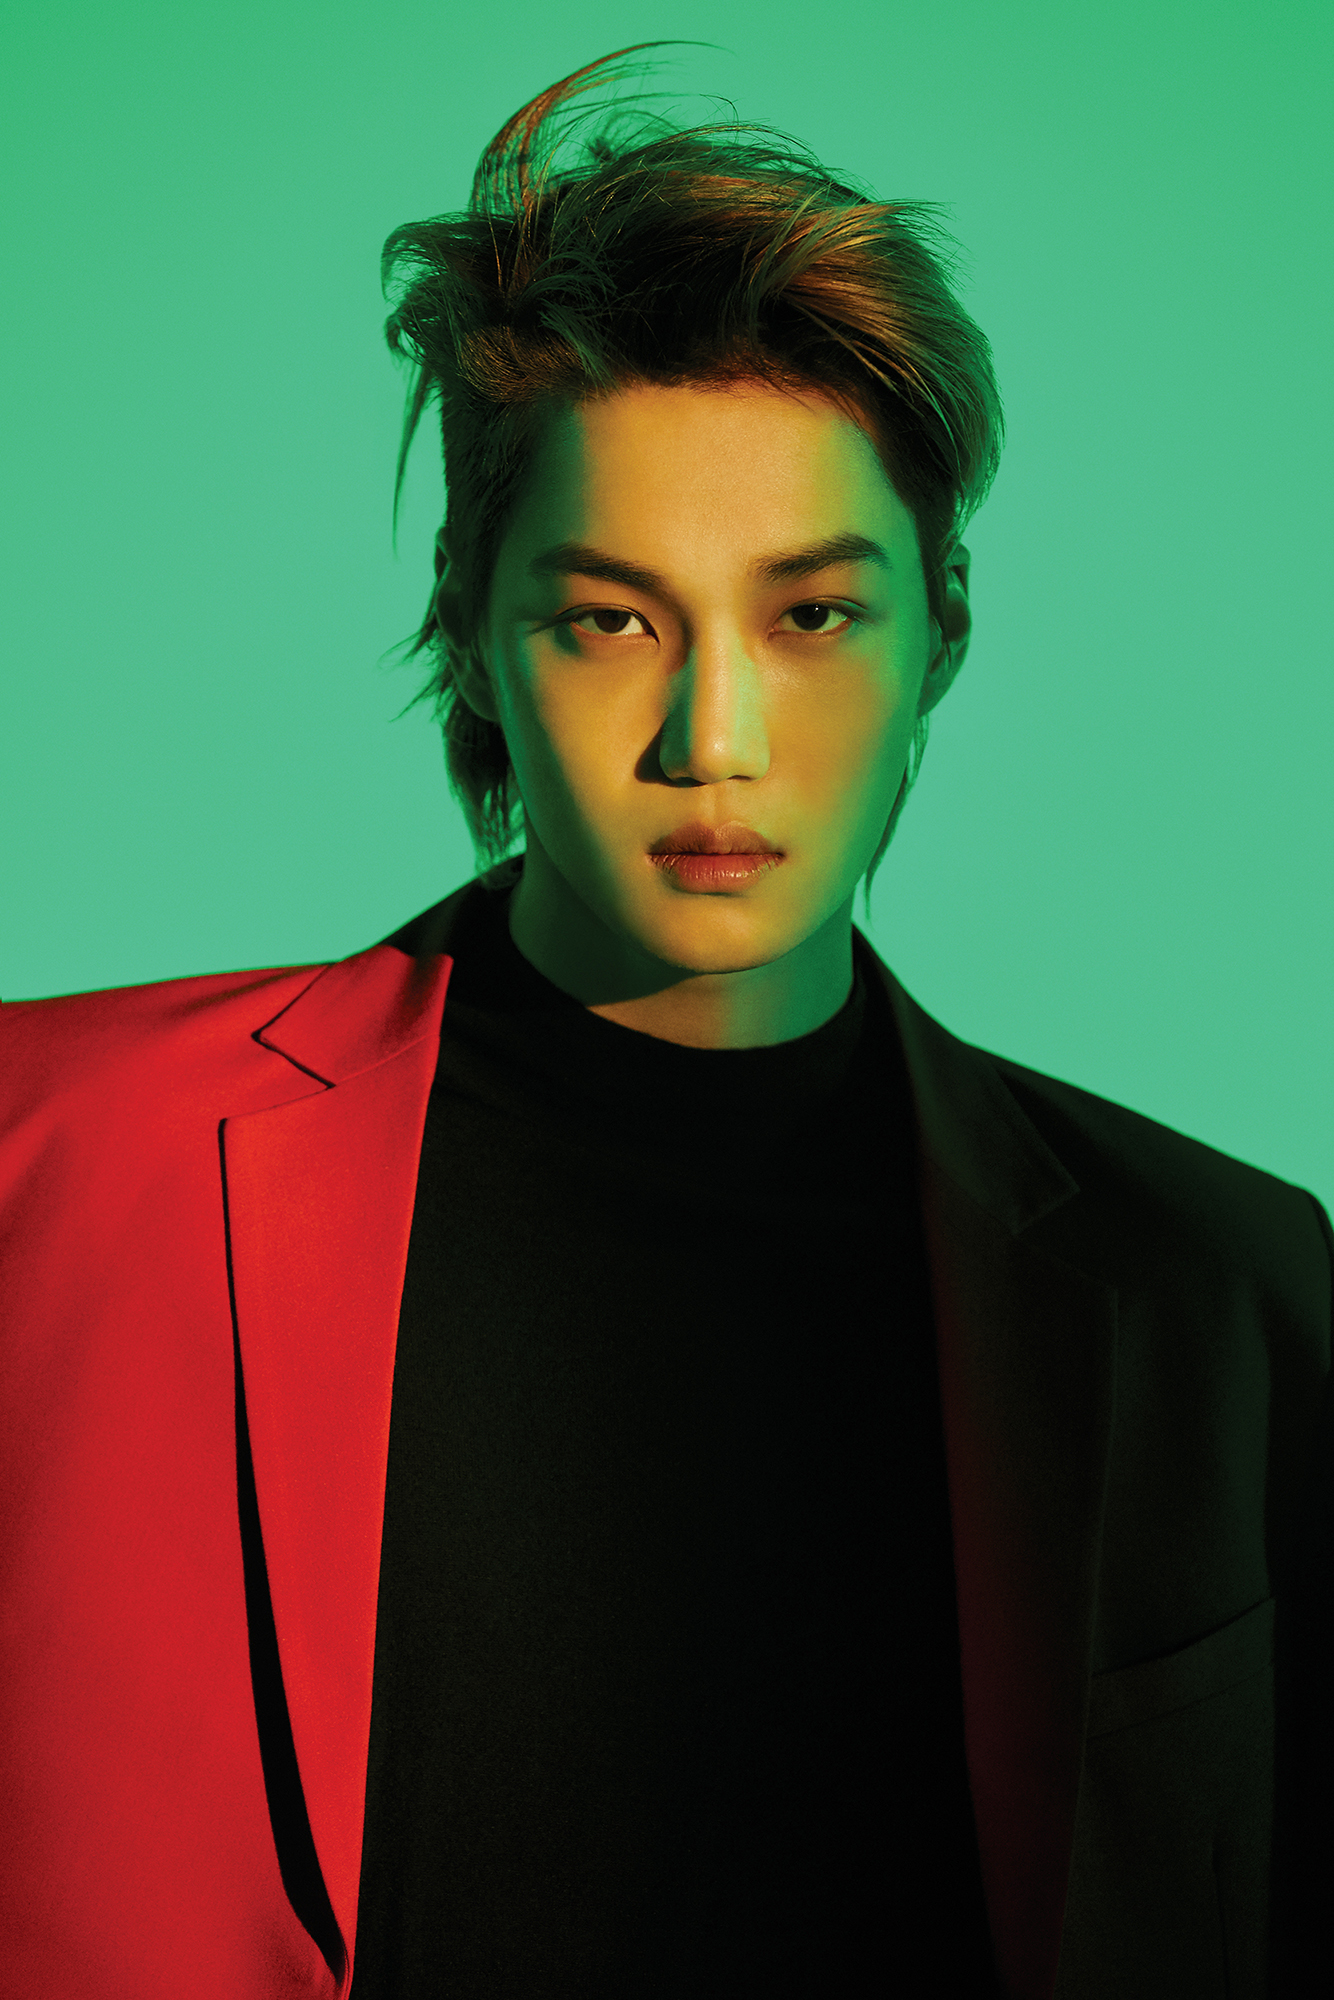 EXO正规5辑后续专辑《LOVE SHOT》回归模式开启